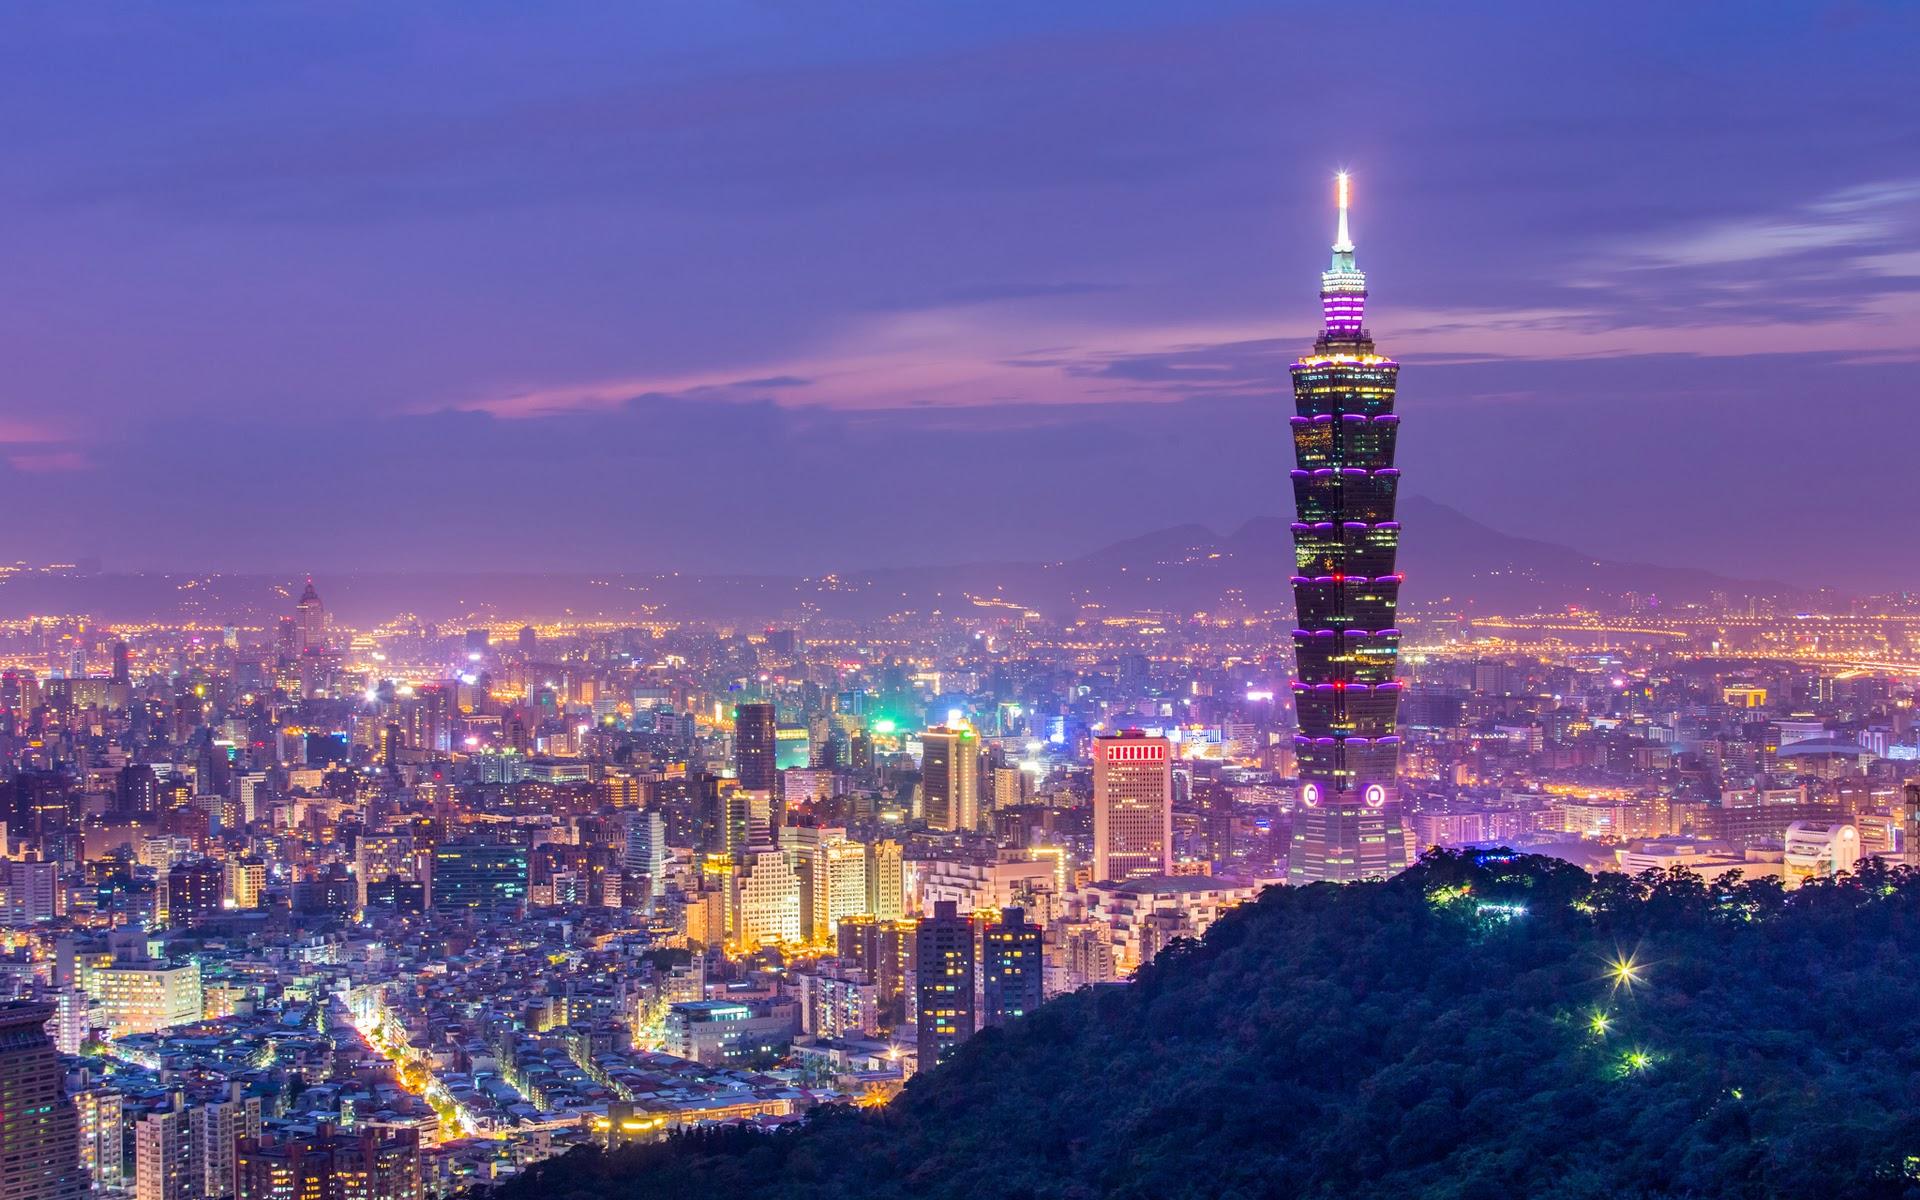 Taipei 101 City View Wallpaper   Travel HD Wallpapers 1920x1200